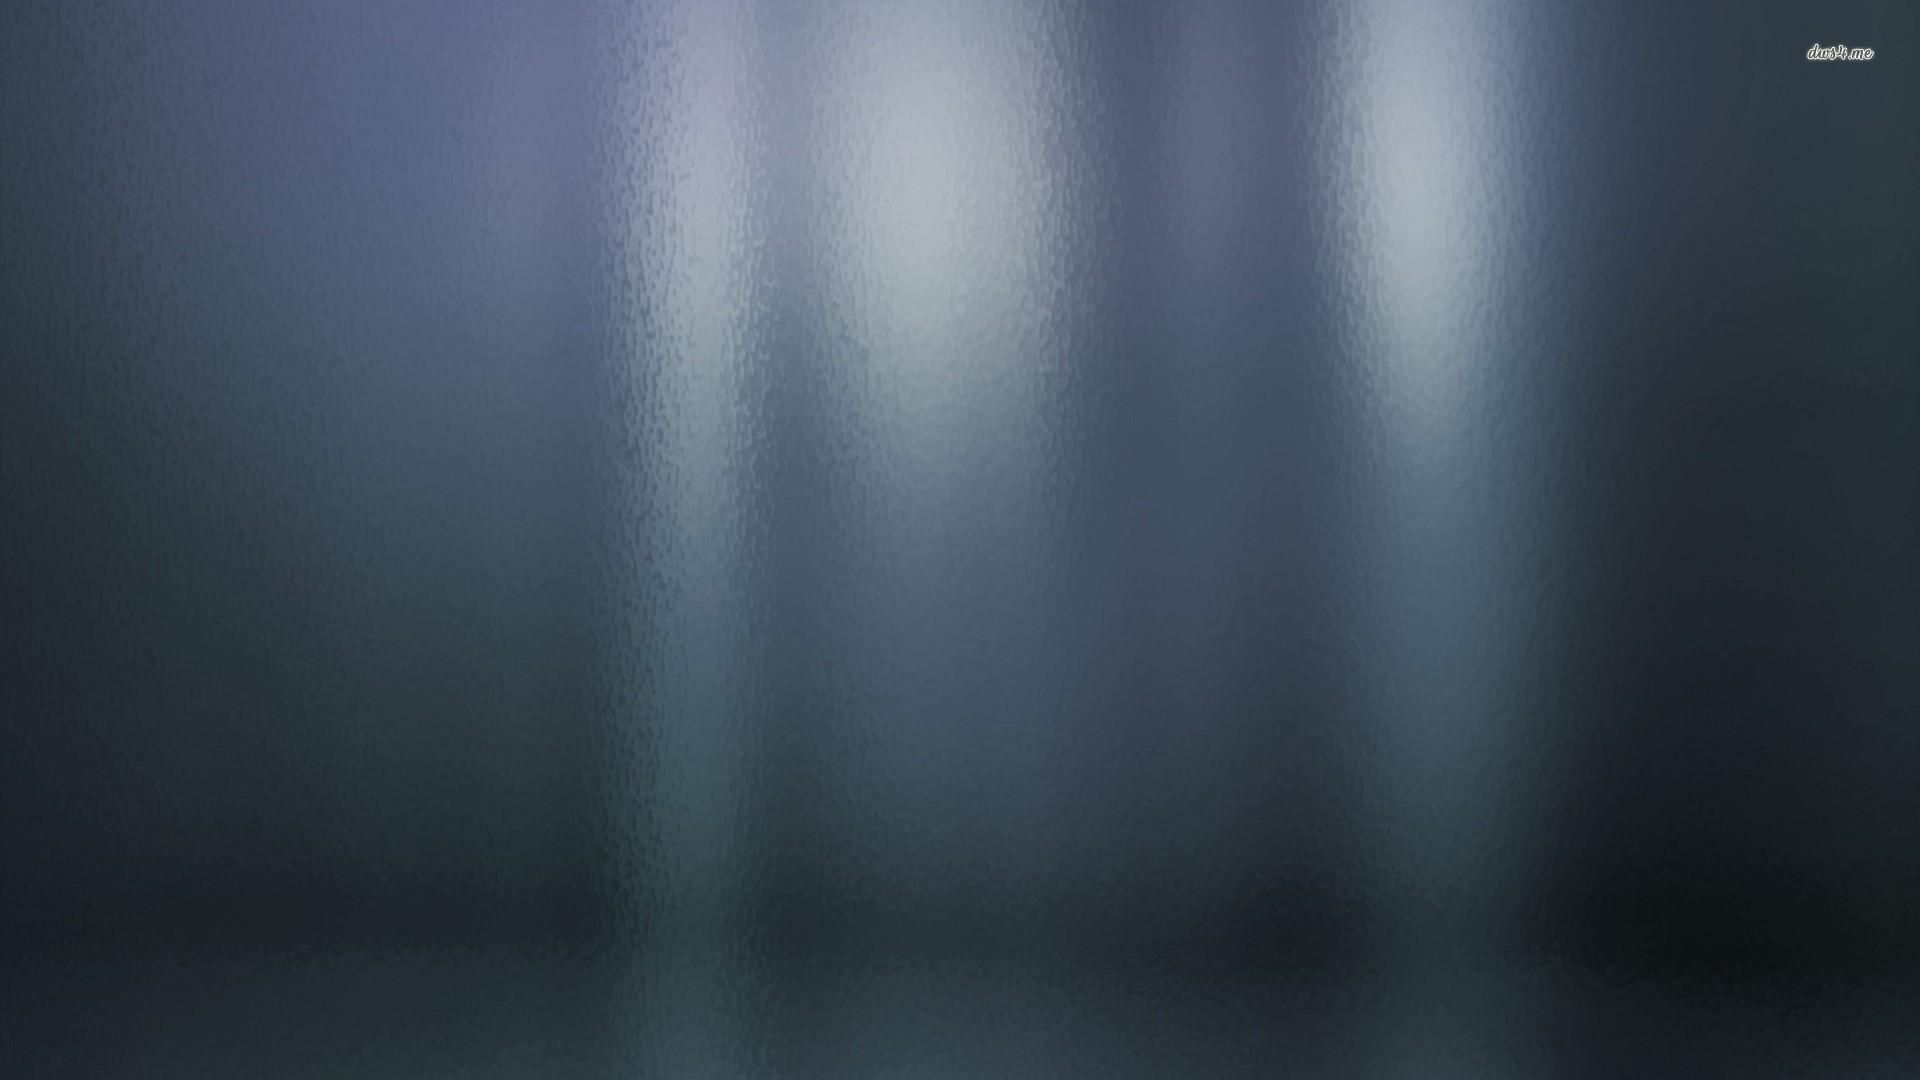 Metallic blue wallpaper wallpapersafari for Metallic wallpaper